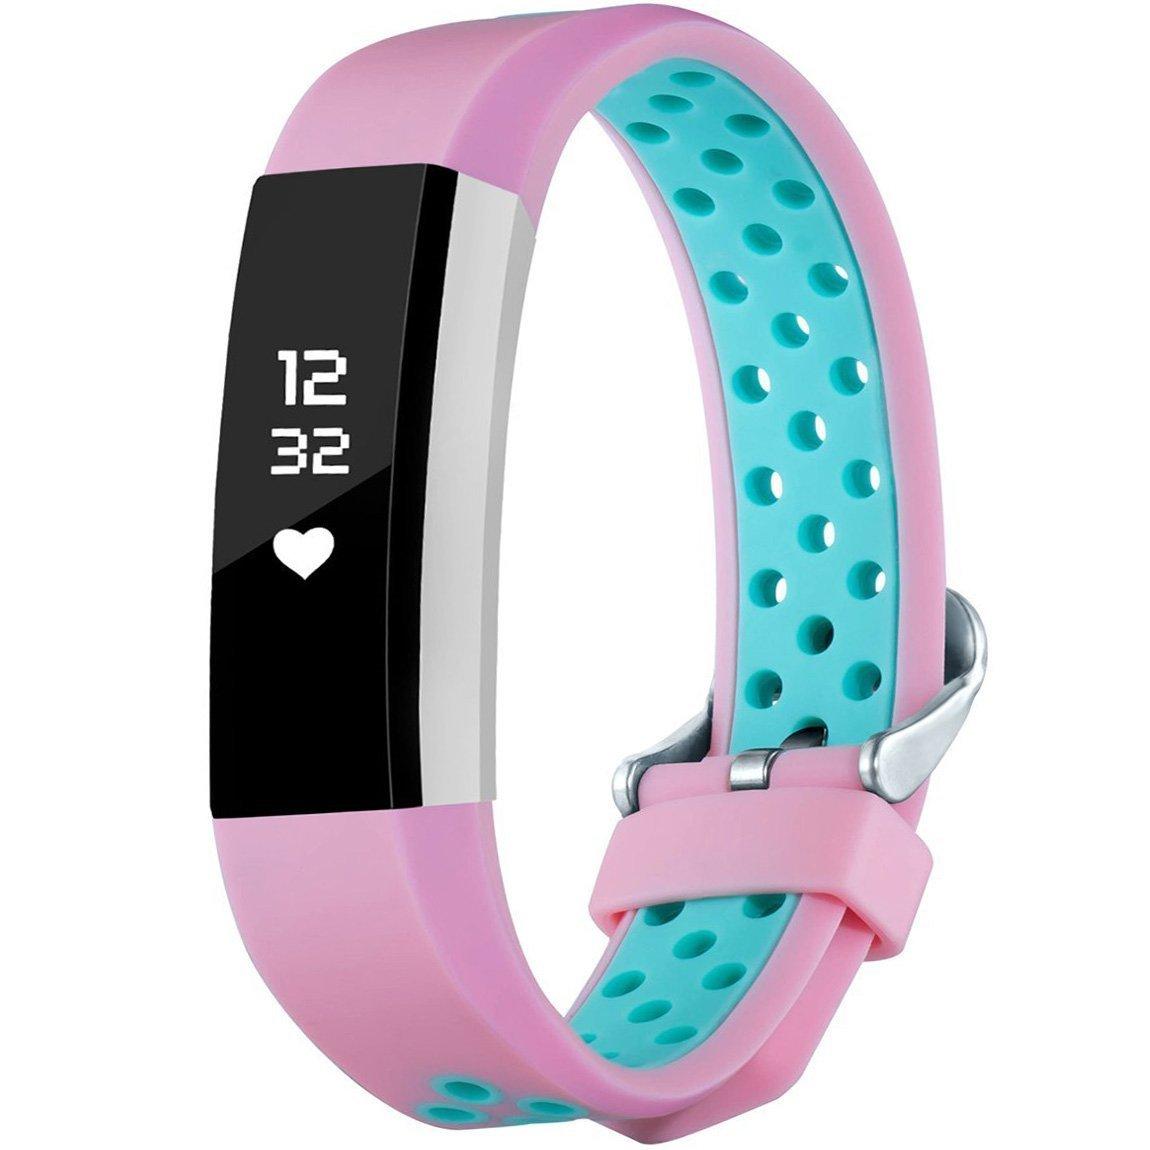 Findway for Fitbit用Aceバンドキッズボーイズガールズティーン、シリコンスポーツバンド交換用ブレスレット手首ストラップアクセサリーバンドFitbit Ace Fitness Smart Watch B07DD89XQX Pink/Teal One Size